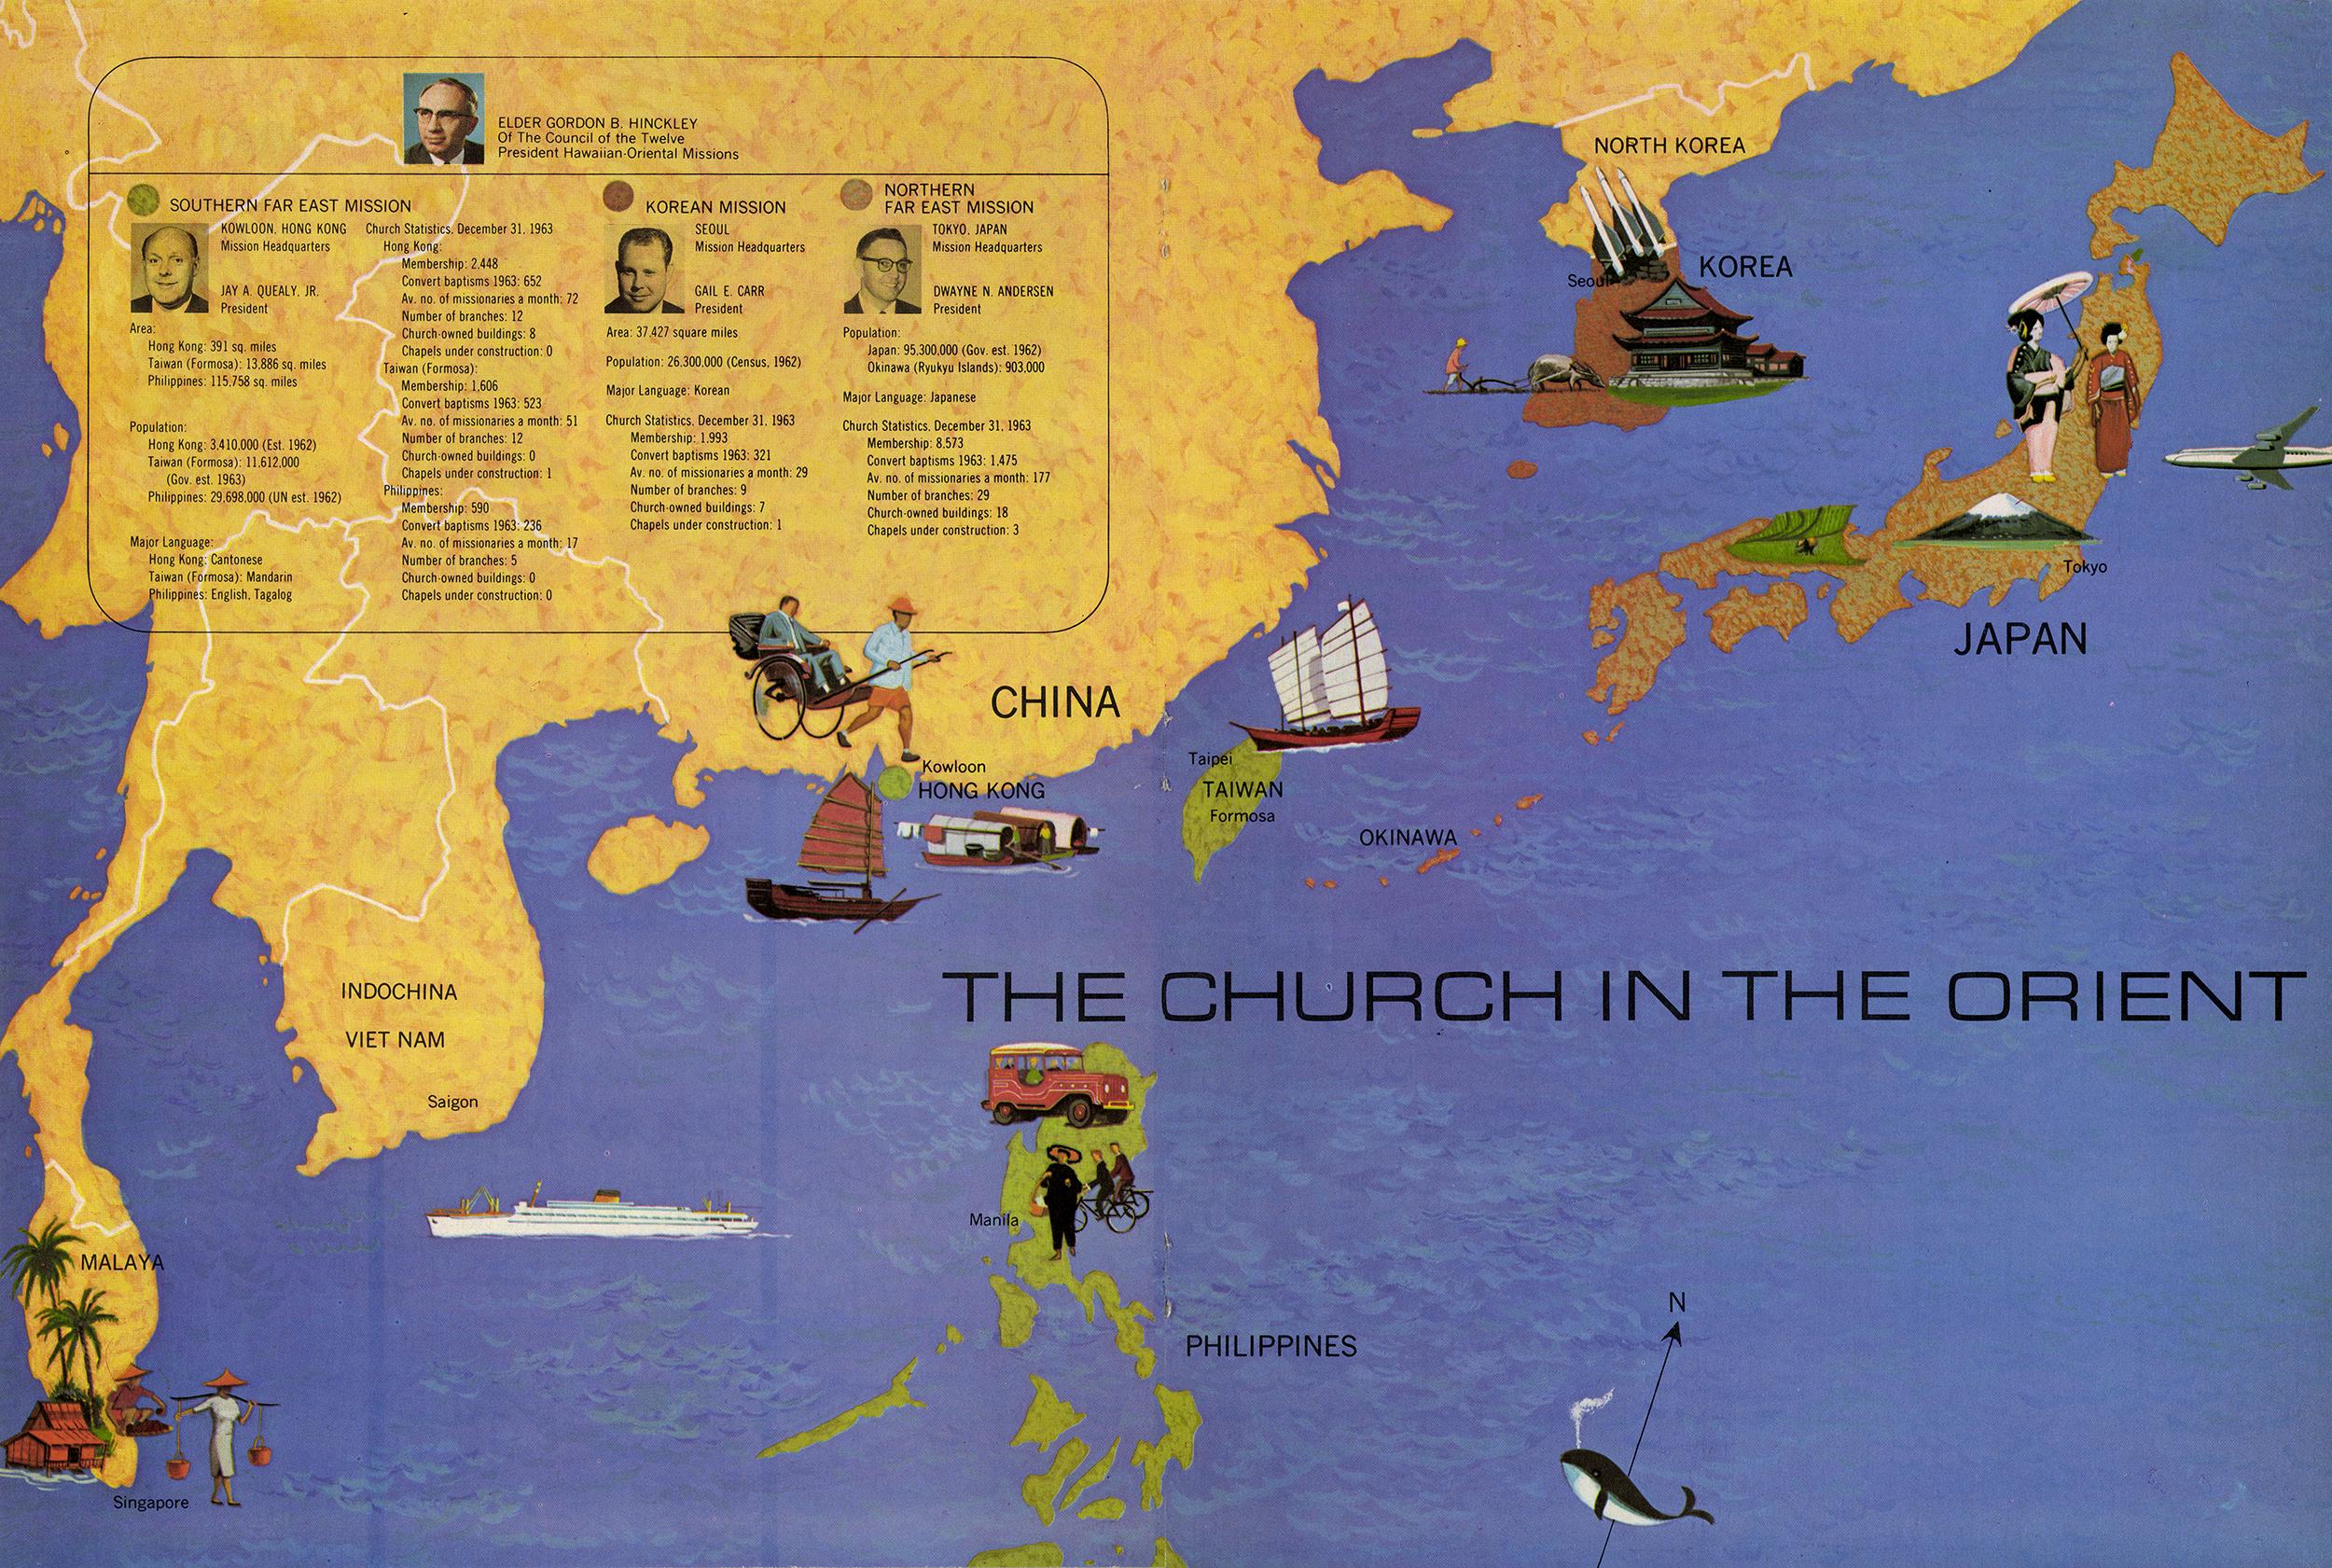 The Church in Asia  Exhibit